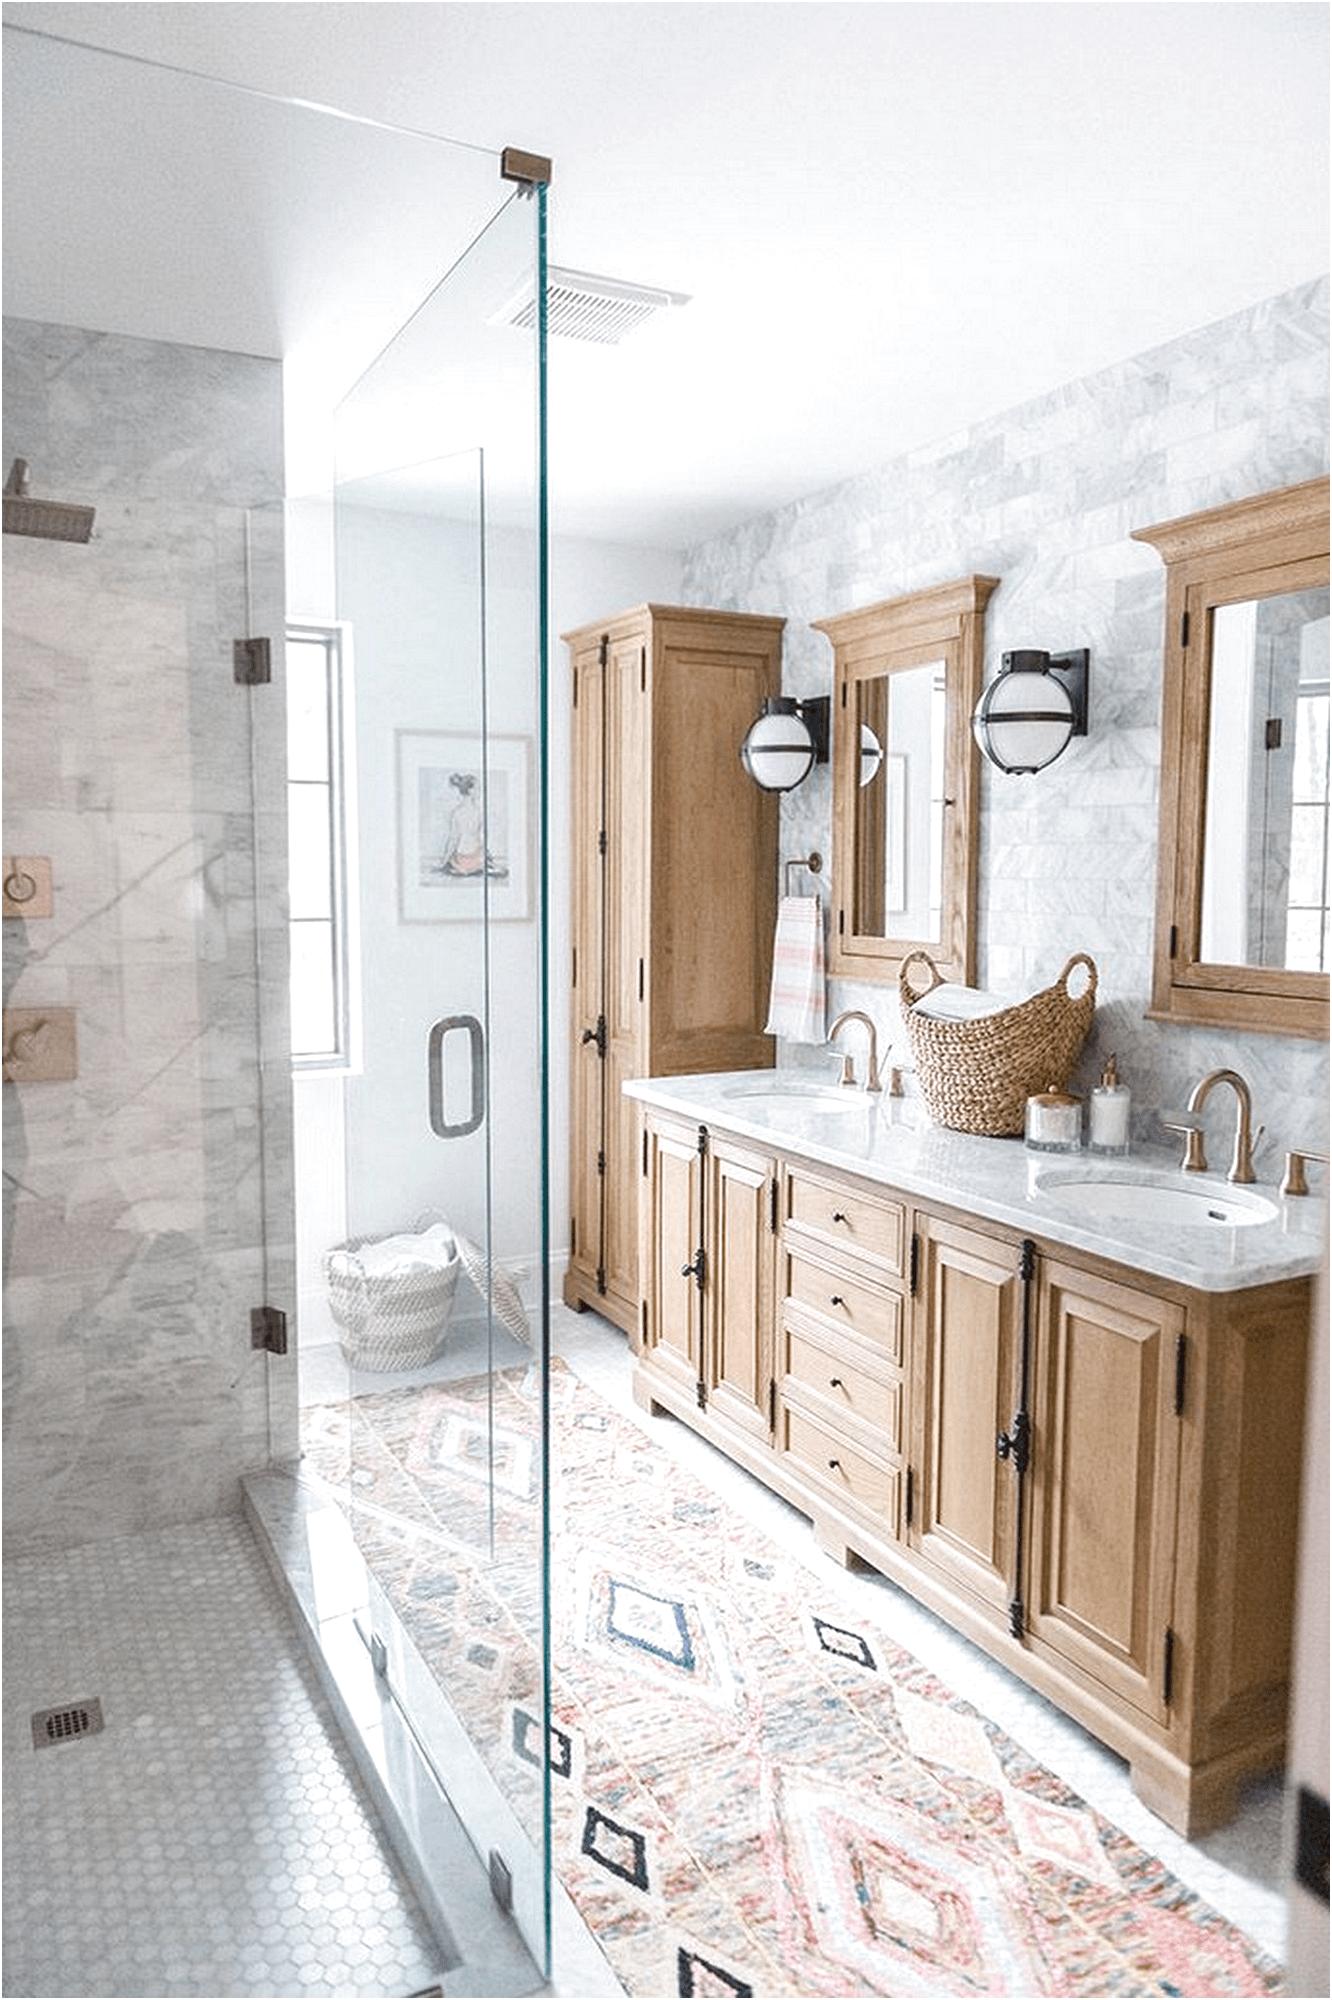 Master Bathroom Rugs Decorating Ideas In 2020 Rustic Bathroom Vanities Bathrooms Remodel Bathroom Design